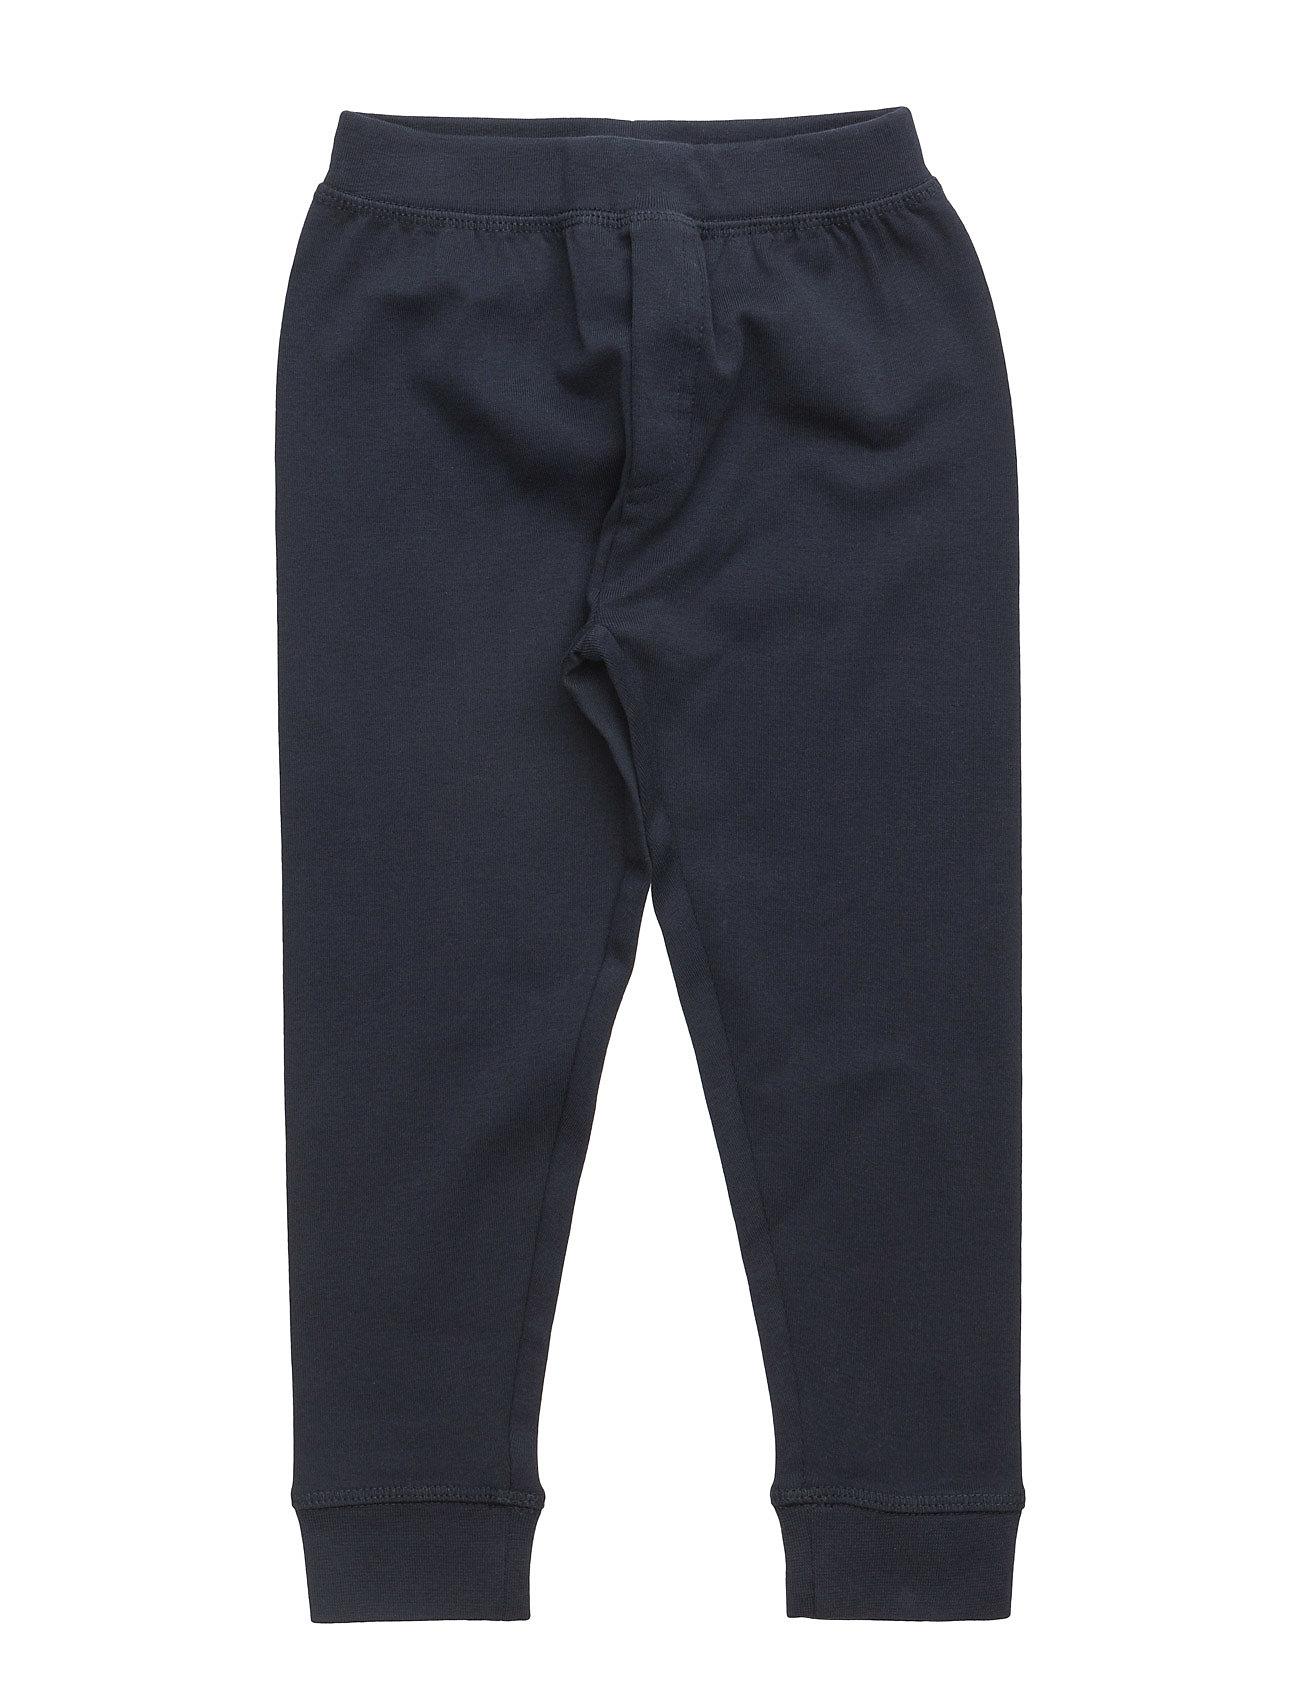 Long Johns Wheat Nat & Undertøj til Piger i Navy blå